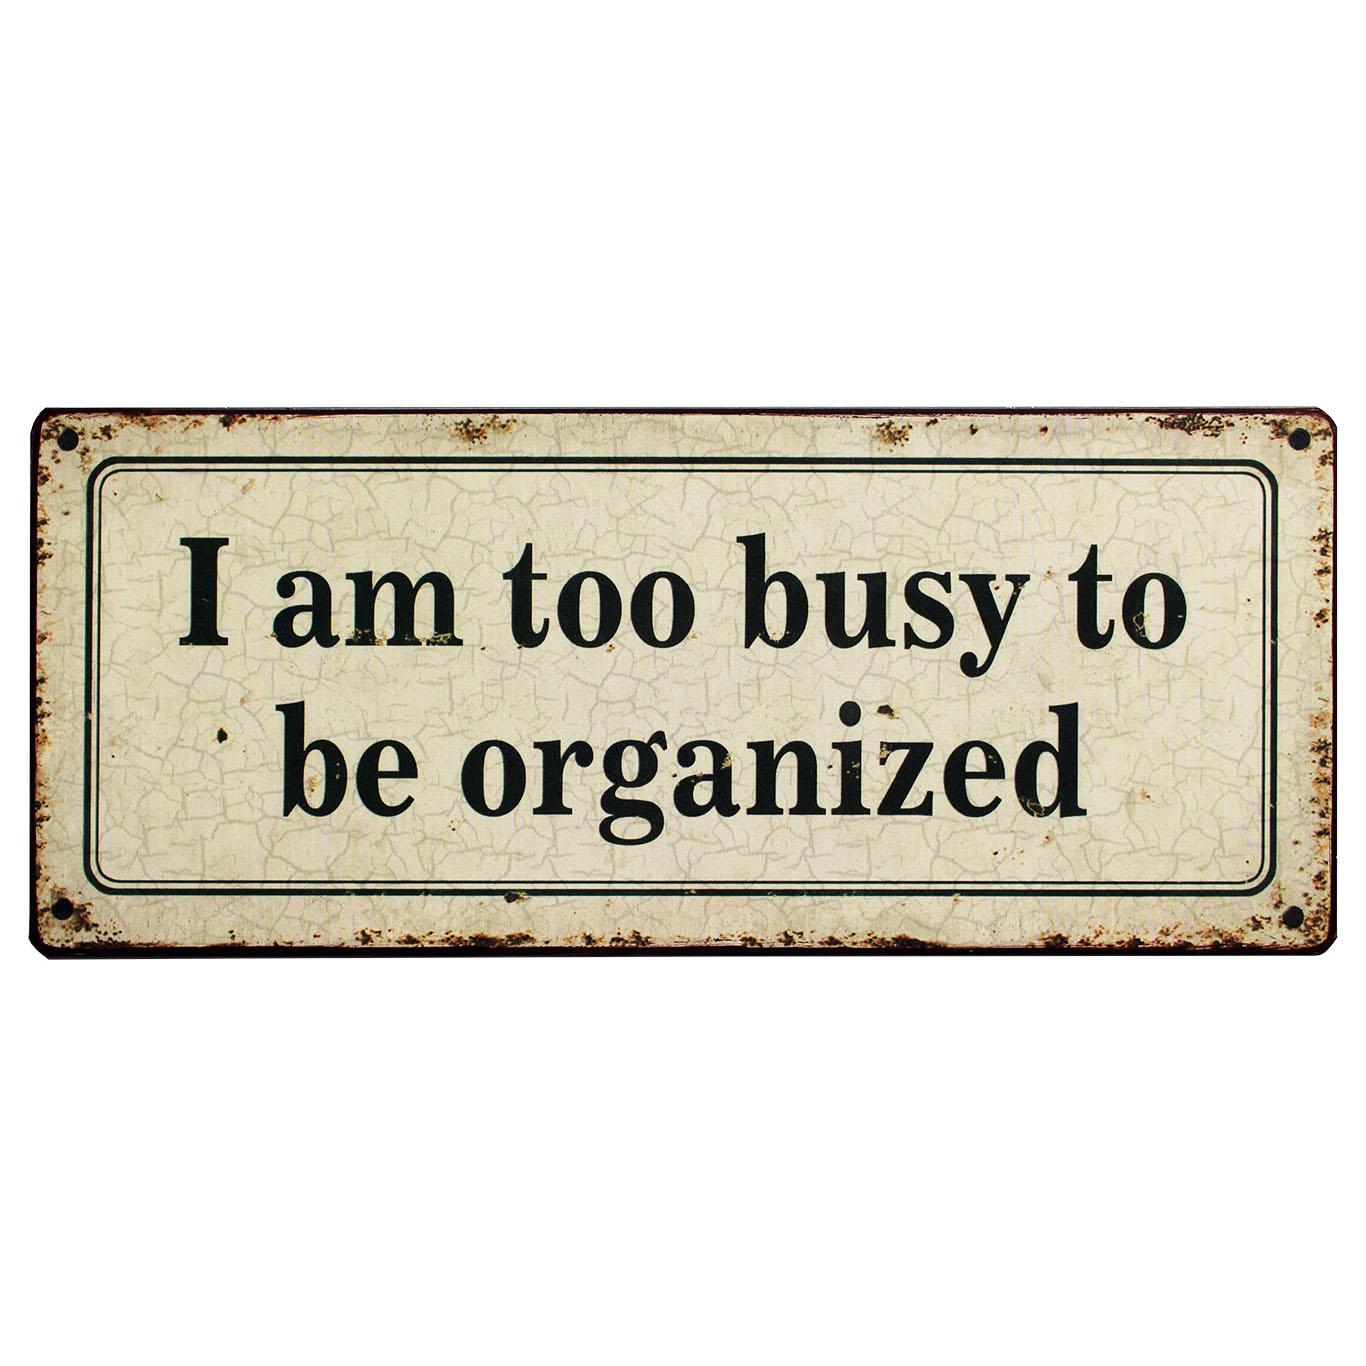 em622-i-am-too-busy-to-be-organized-spreukenbord-tekstbord-uitspraken-gezegde-spreuken-rustiek-bord-cadeau v